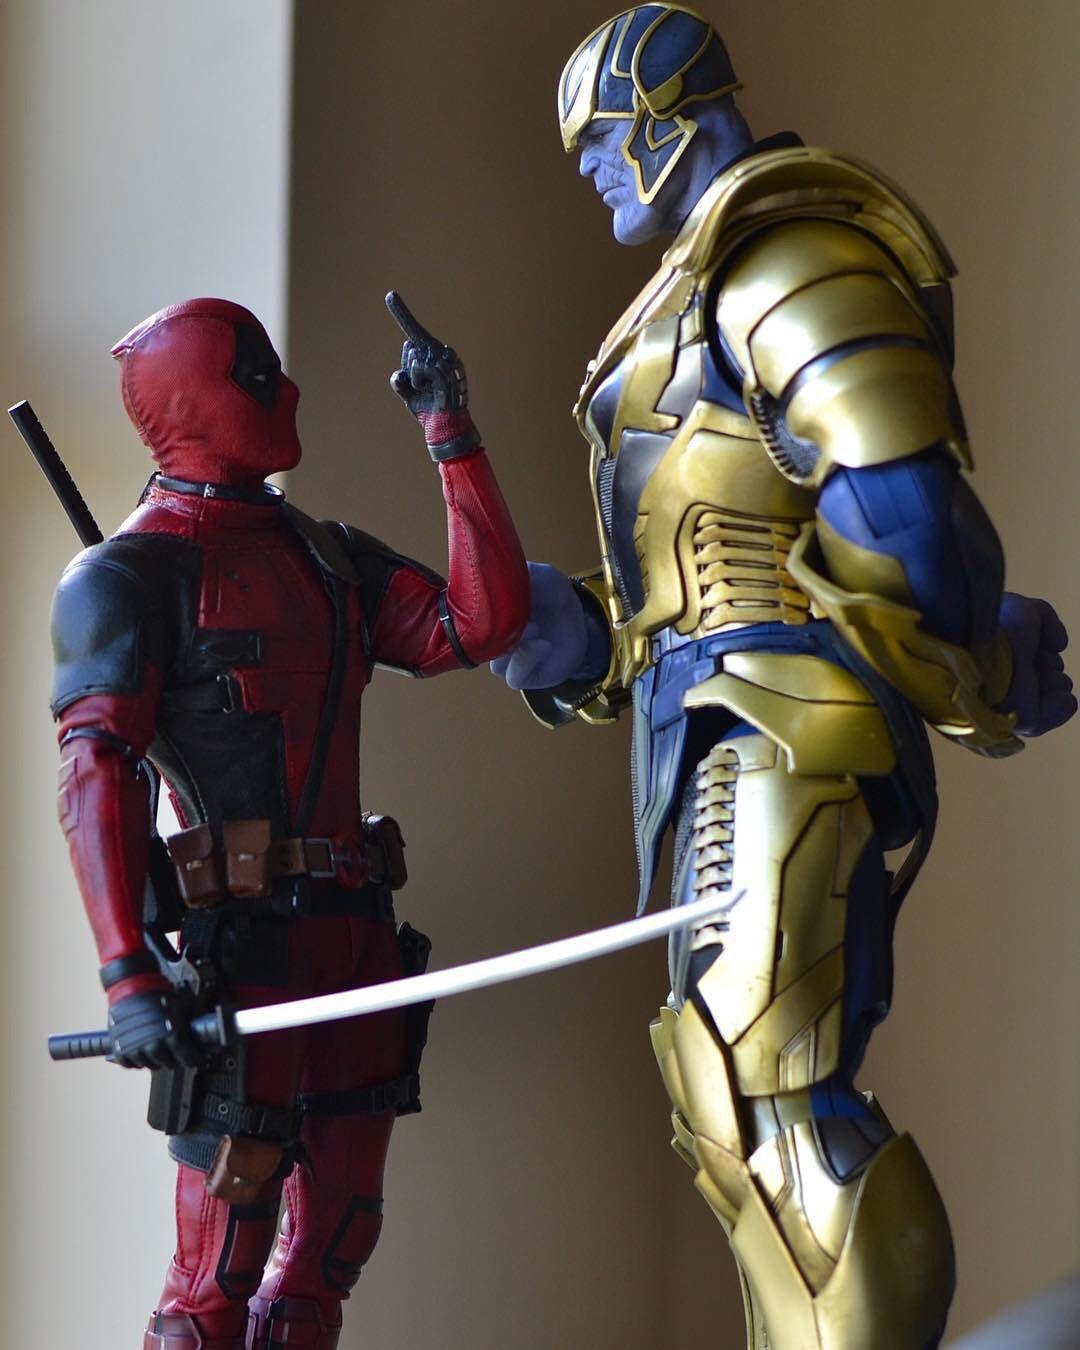 Marvel Deadpool Ausmalbilder Gratis: Deadpool Or Thanos??? . Toy Art By @seattlegeek . Pics Via